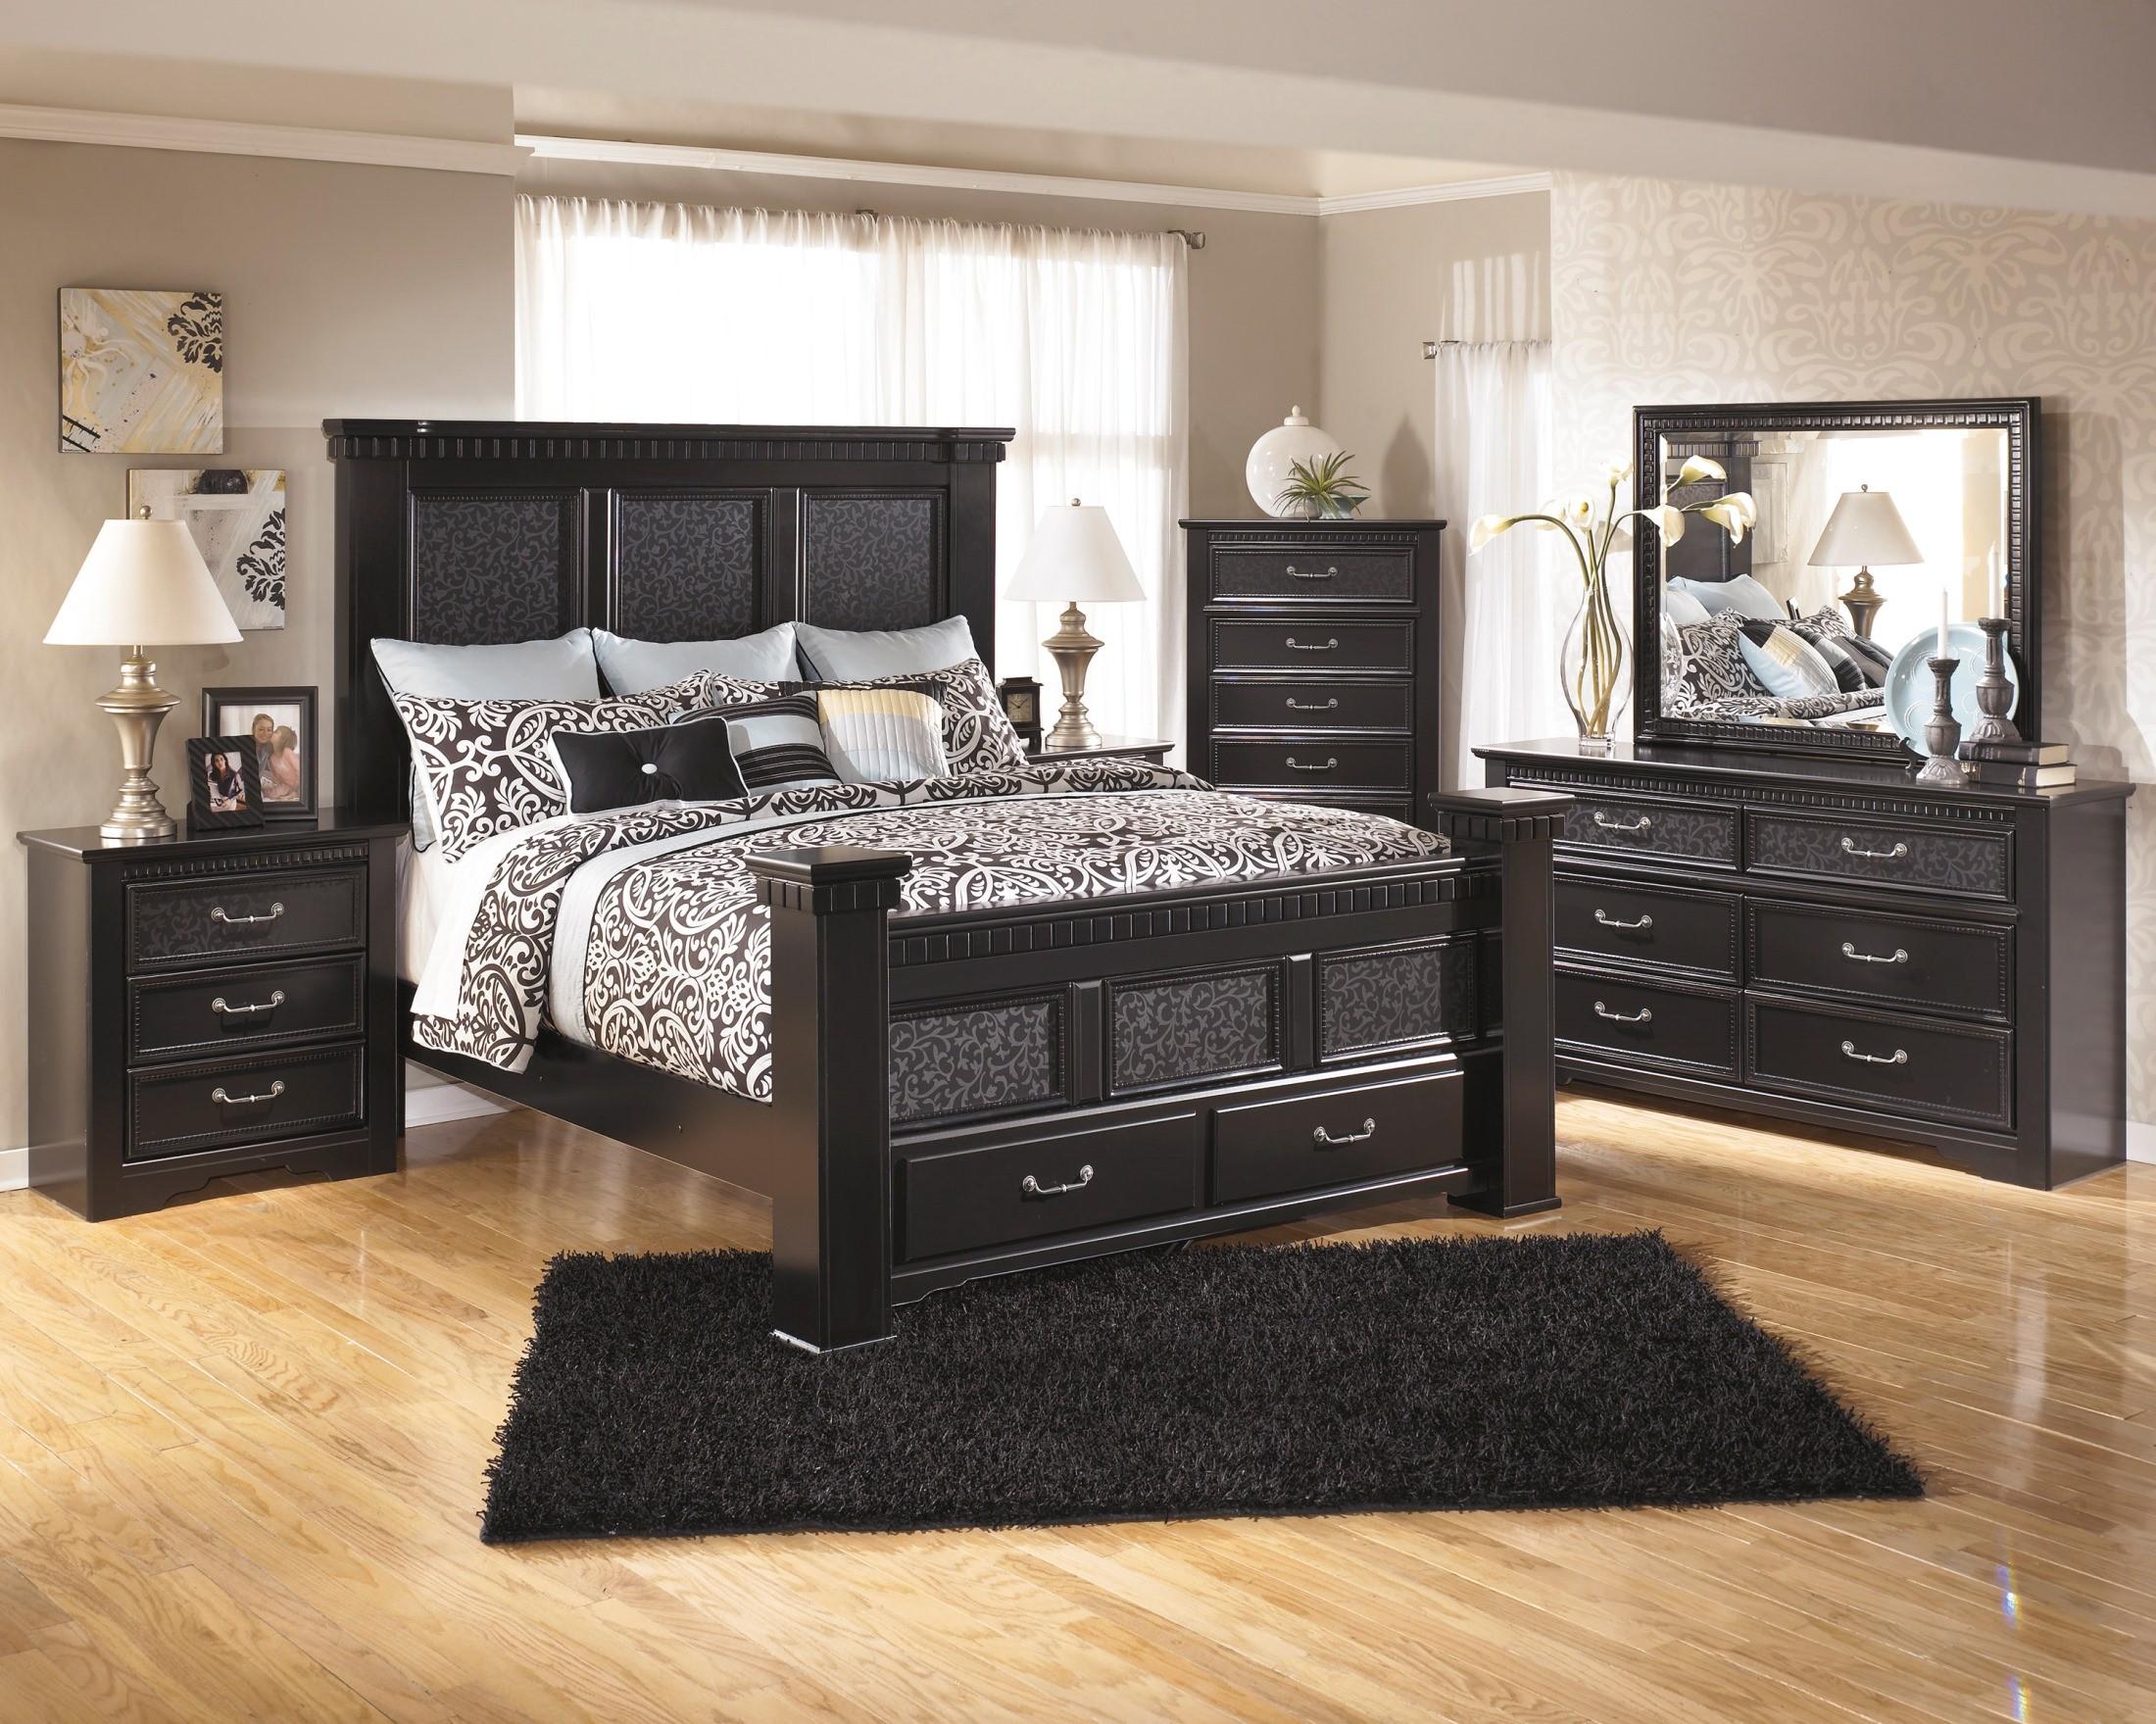 Ashley Furniture Kitchener Costco Bedroom Set King Furniture Clearance Costco Bedroom Sets